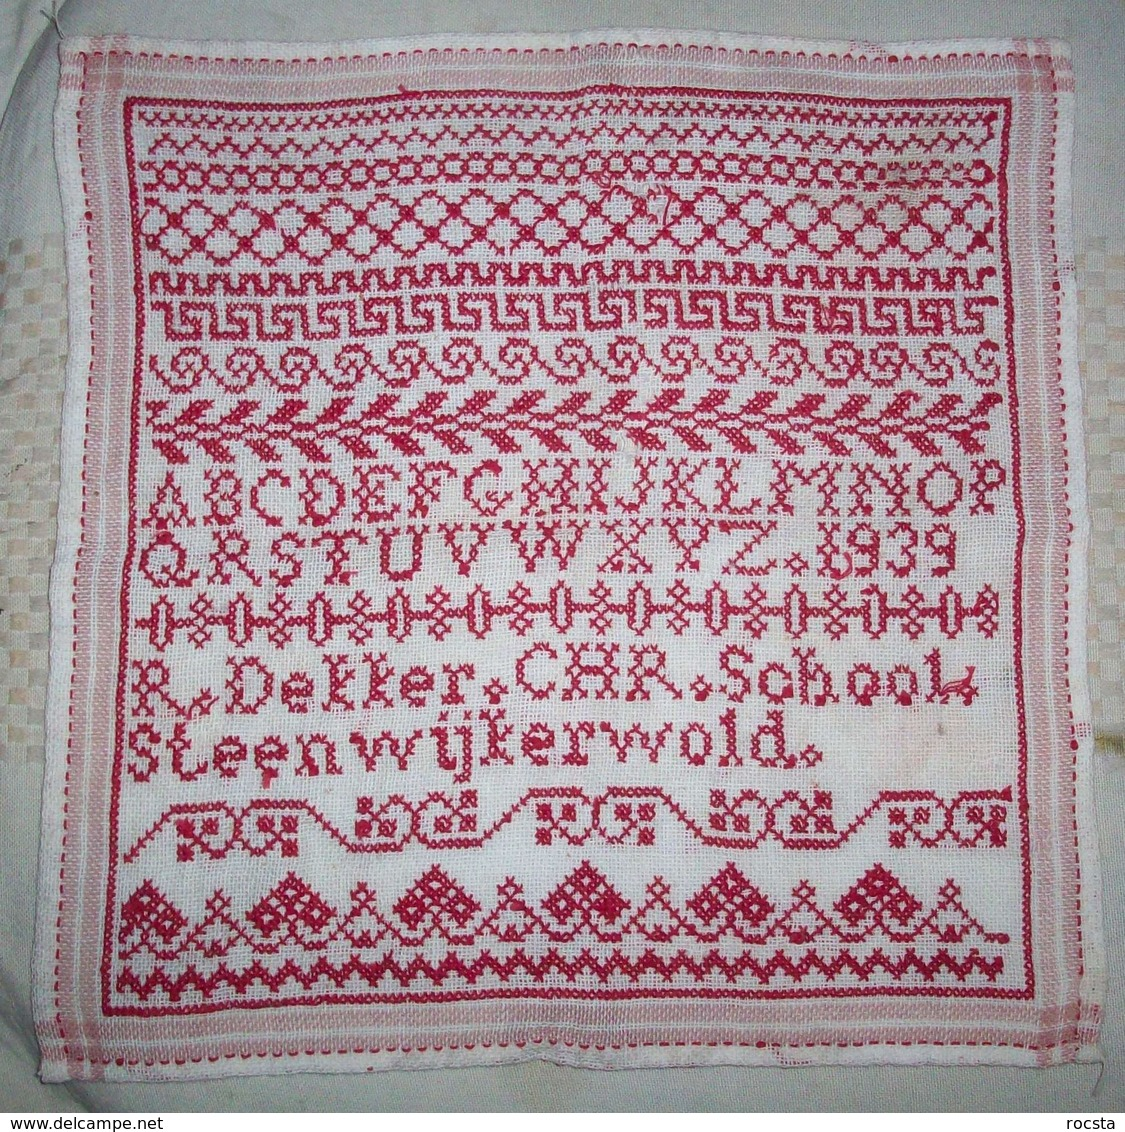 Antique Needlework Napkin R.Dekker CHR School Steenwijkerwold (1939 Dated) - Andere Sammlungen